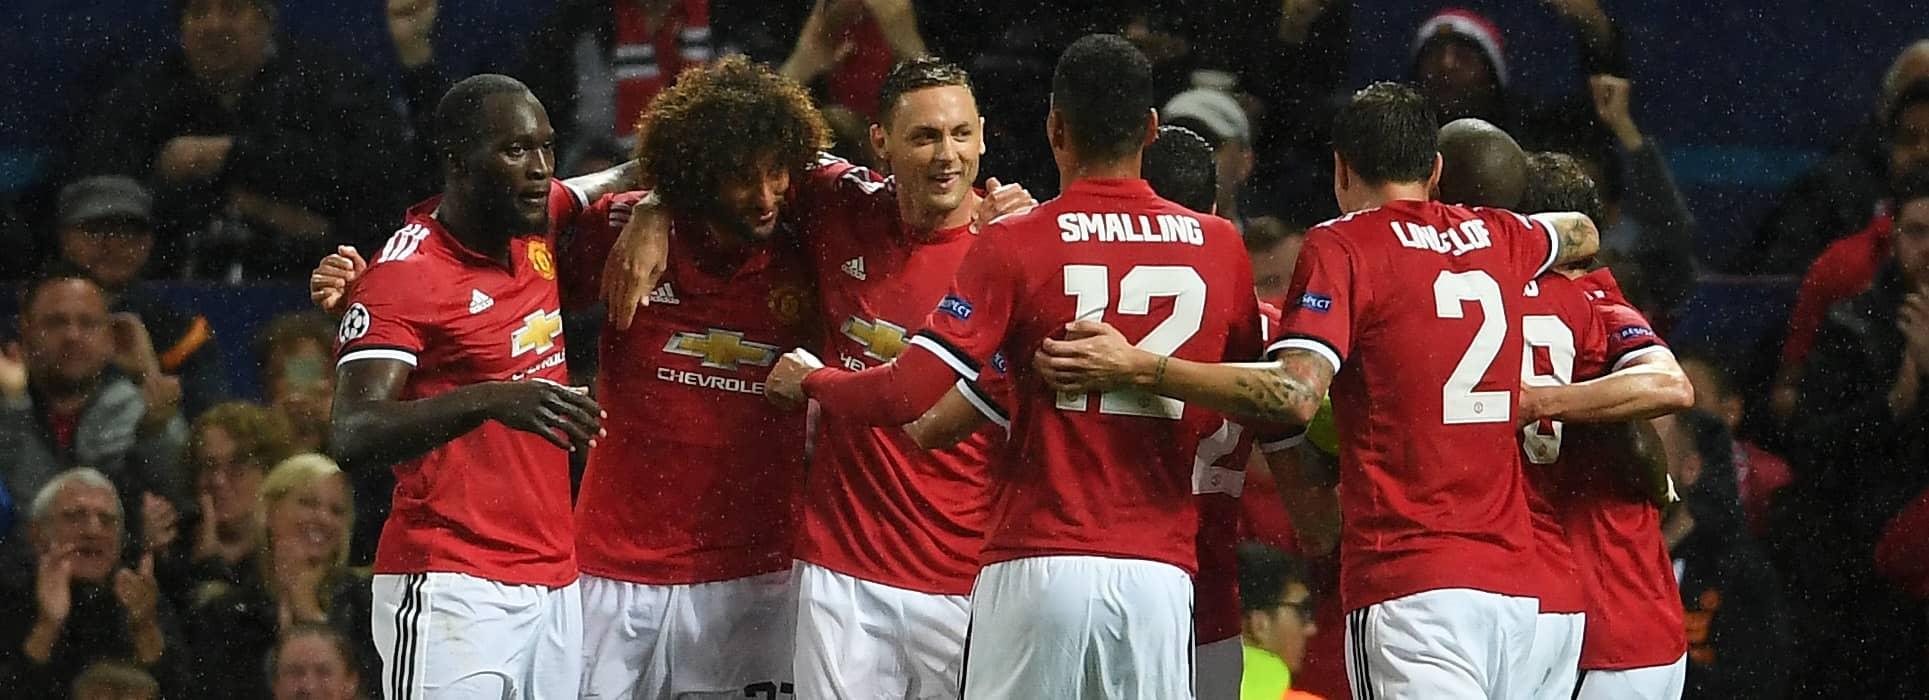 Manchester United fans praise Nemanja Matic's performance vs Benfica